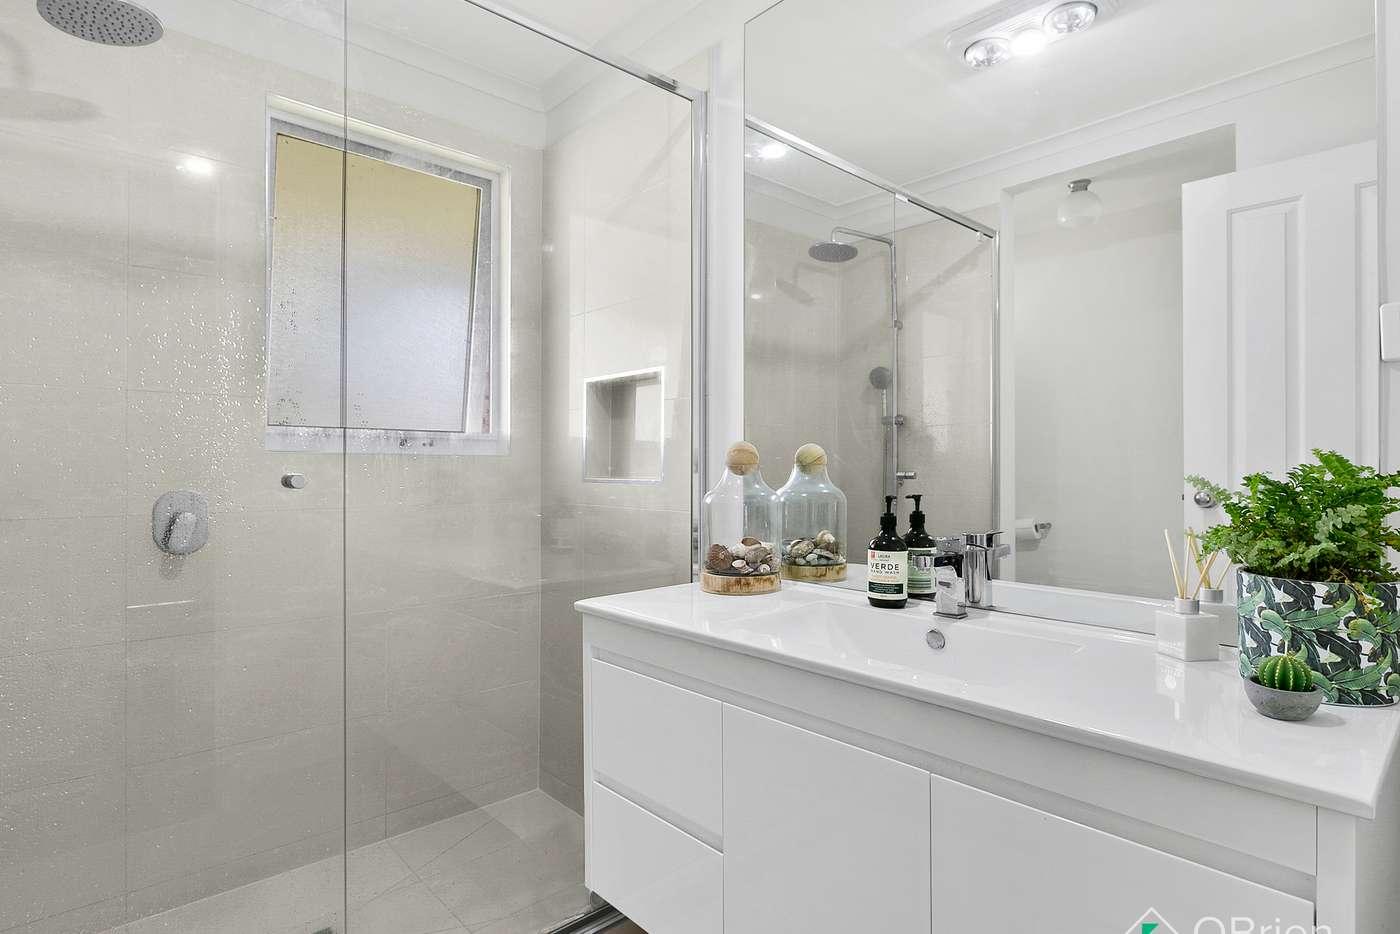 Sixth view of Homely house listing, 53 Carramar Street, Mornington VIC 3931